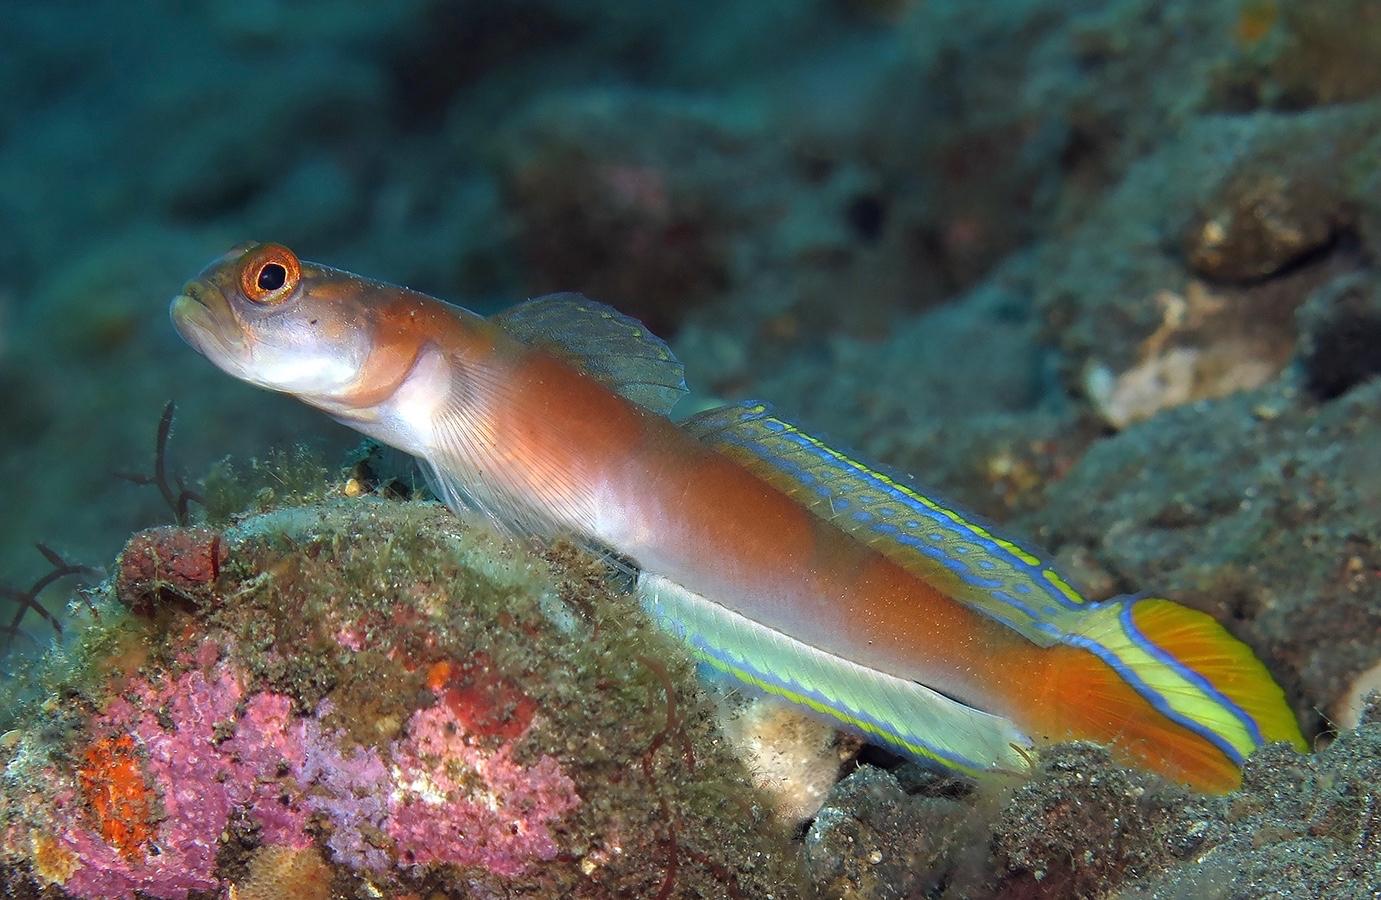 Amblyeleotris yanoi     巴厘岛图蓝本 Tulamben 印度尼西亚 Indonesia @lazydiving.com 潜水时光